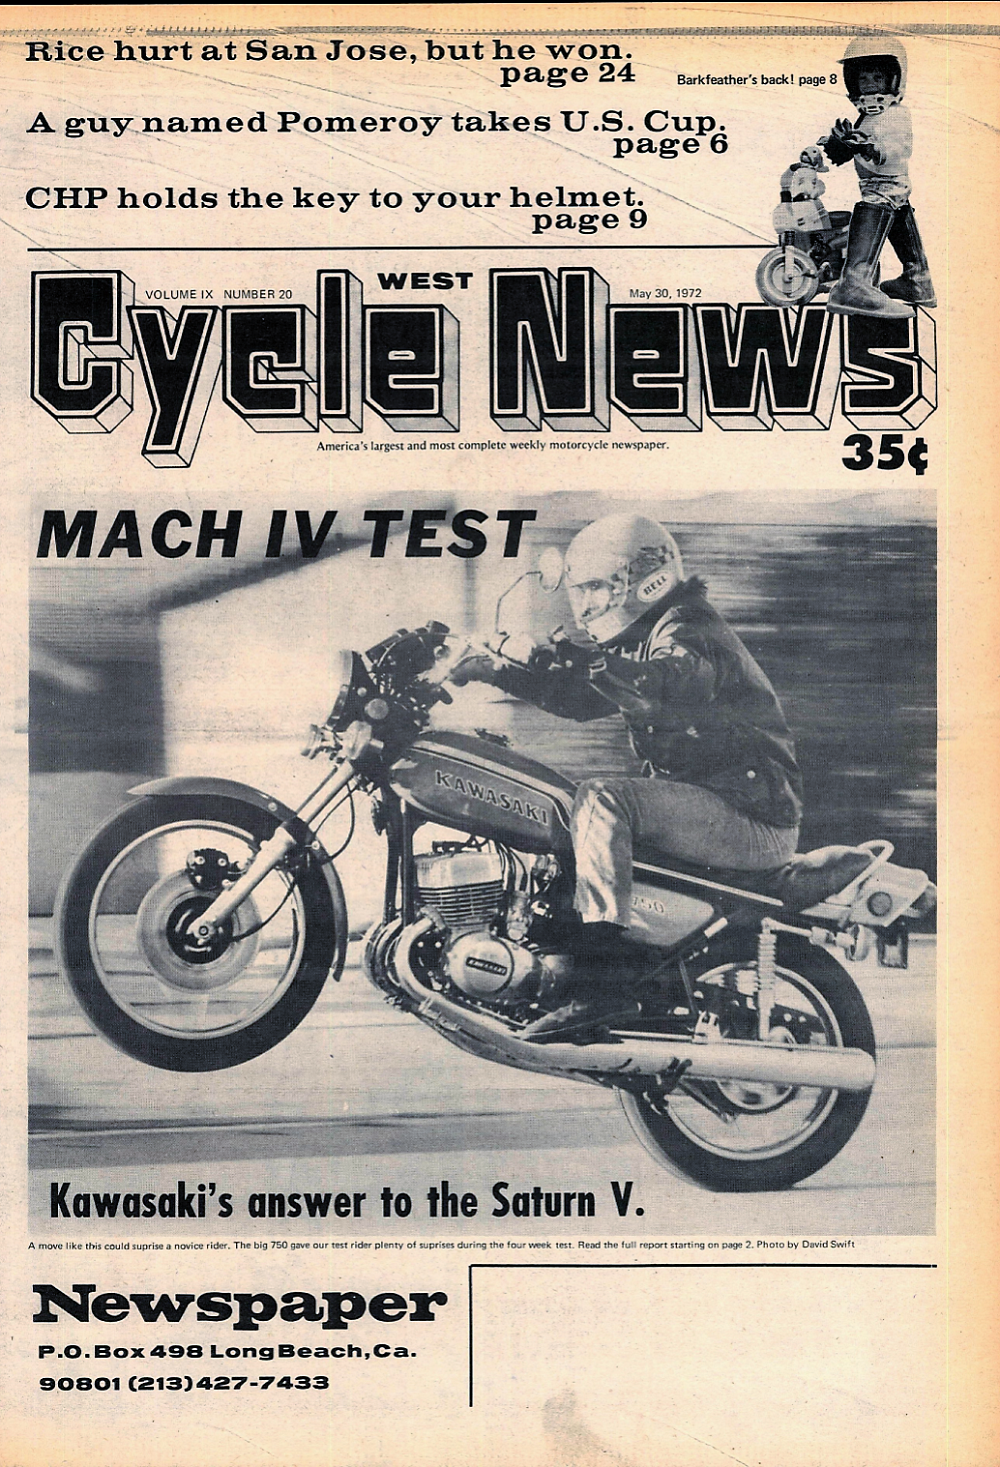 1972 Kawasaki 750 mach IV road test.1.jpg